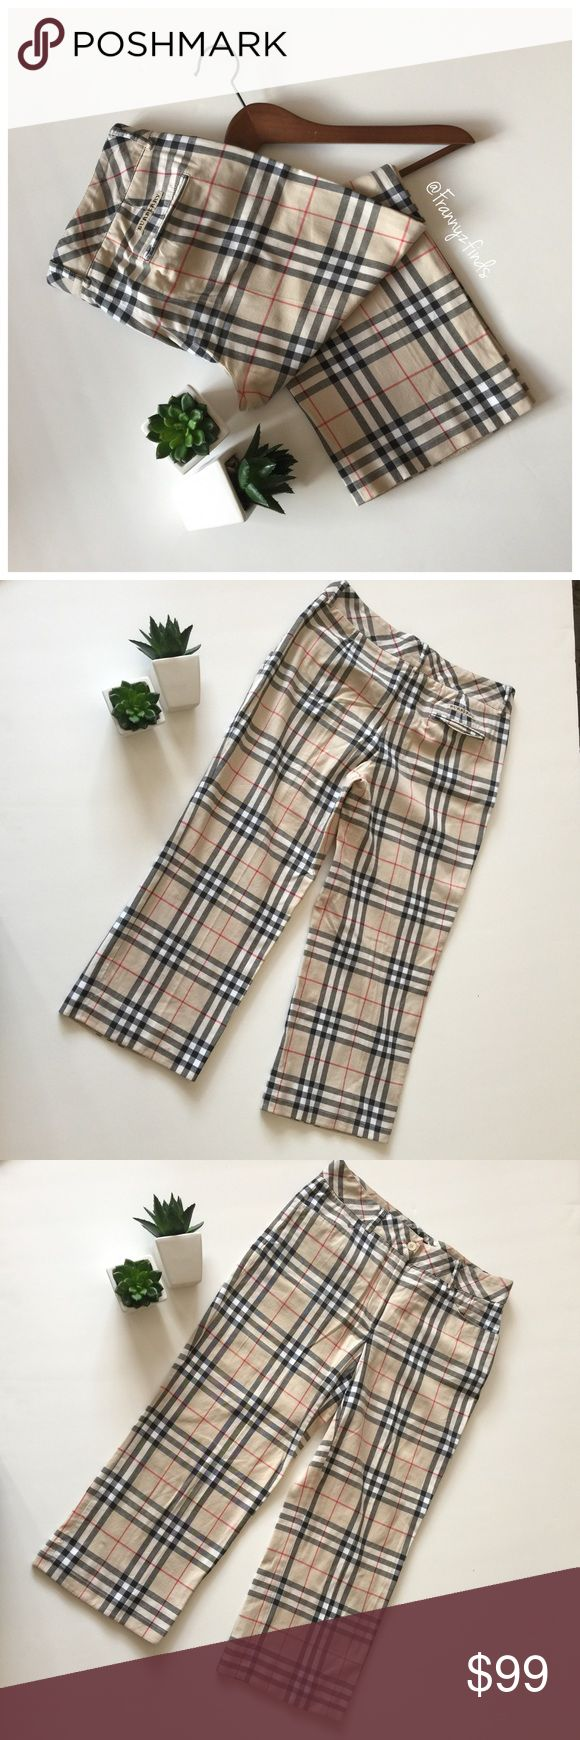 • Burberry Classic Golf Capri • NWOT • Classic Burberry Print • Two Front Pockets • One Mock Back Pocket • Belt Loop • Zipper and Button Closure • Waist 32 • Hip 38 • Length 32 • Inseam 21 Burberry Pants Capris